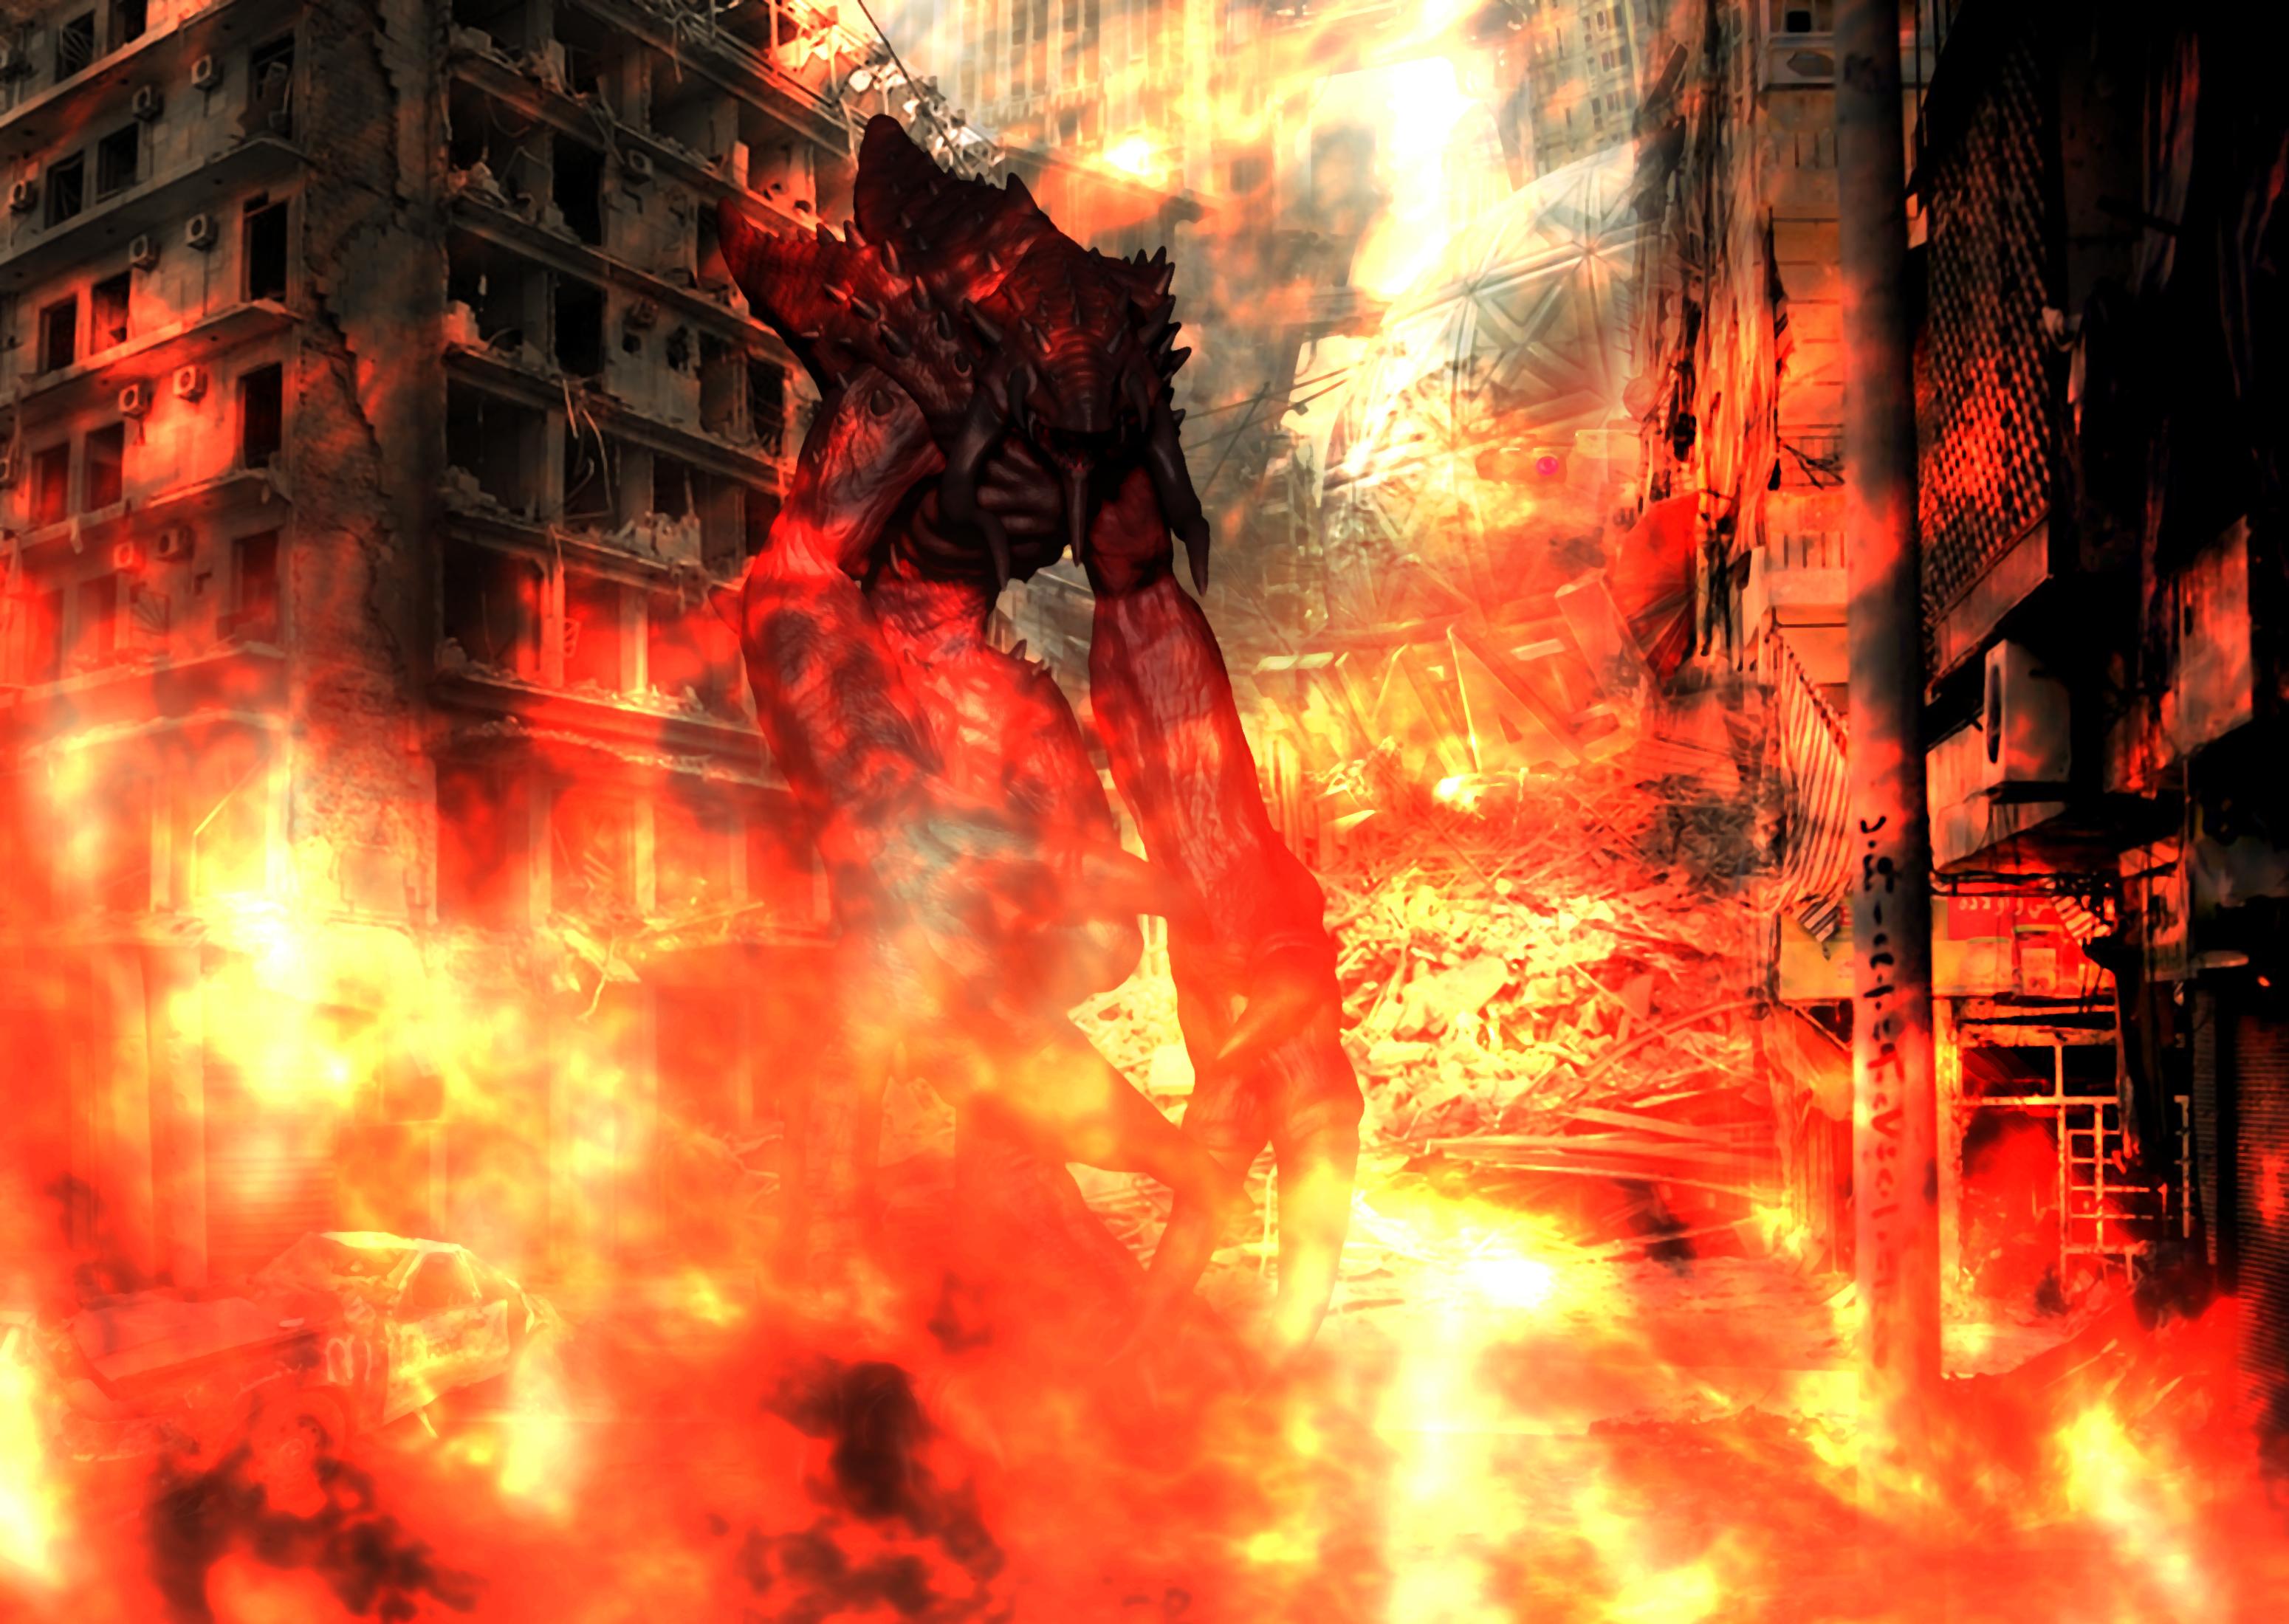 Dark Girl Wallpaper City In Flames The Rager Image Dark Force Science